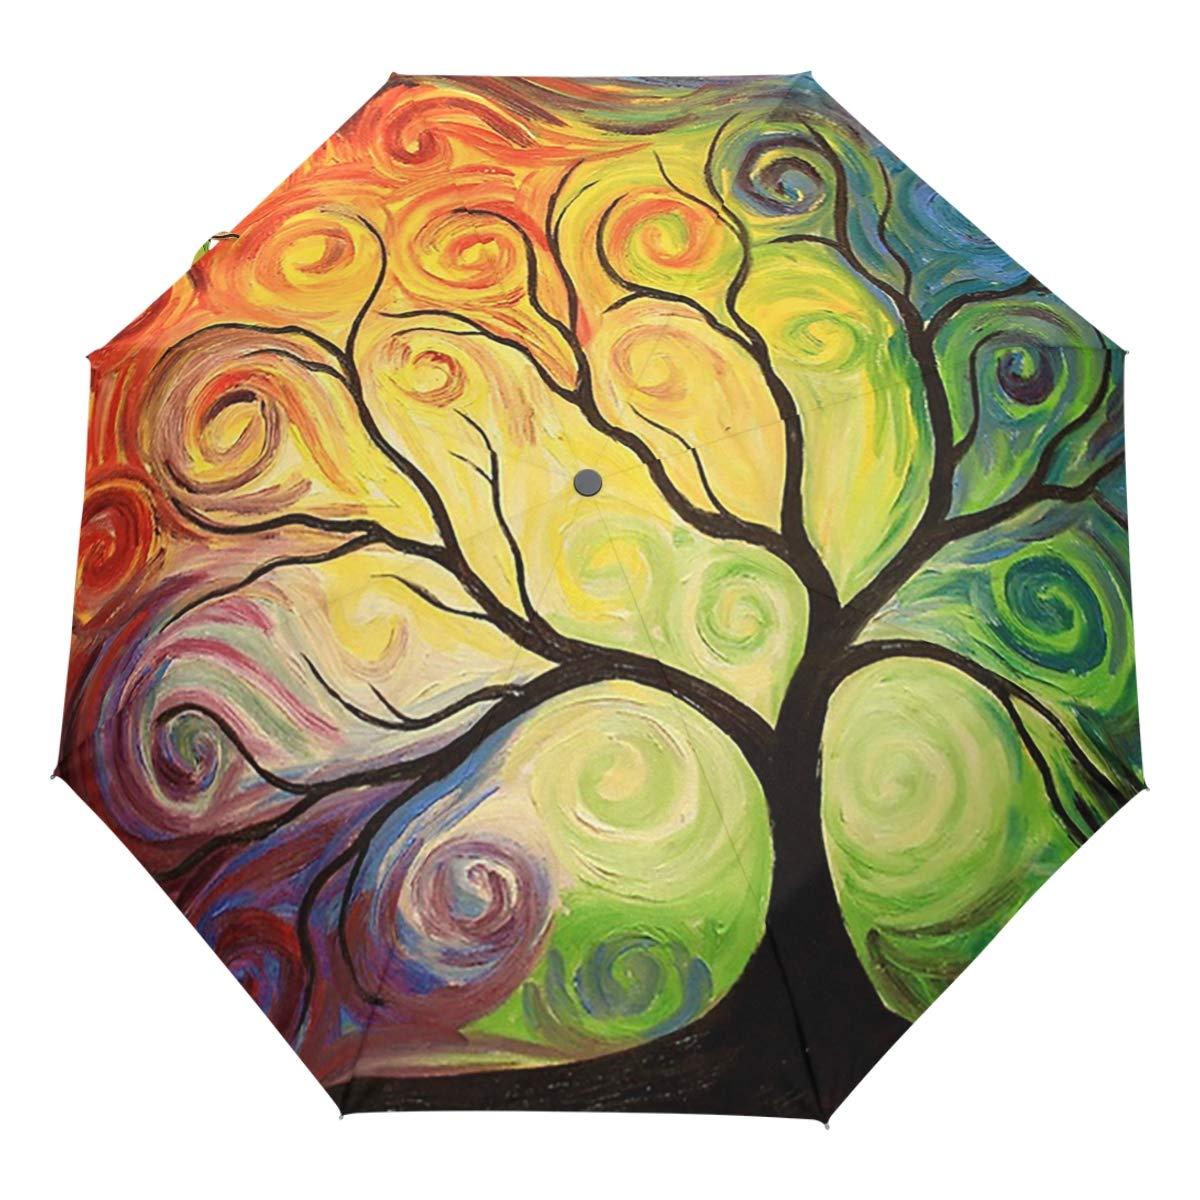 Wamika Rainbow Tree of Life Auto Umbrella Open Close Oil Painting Art Anti-UV Umbrellas Compact Windproof Lightweight Parasol Umbrella for Travel Car School Sun Rain